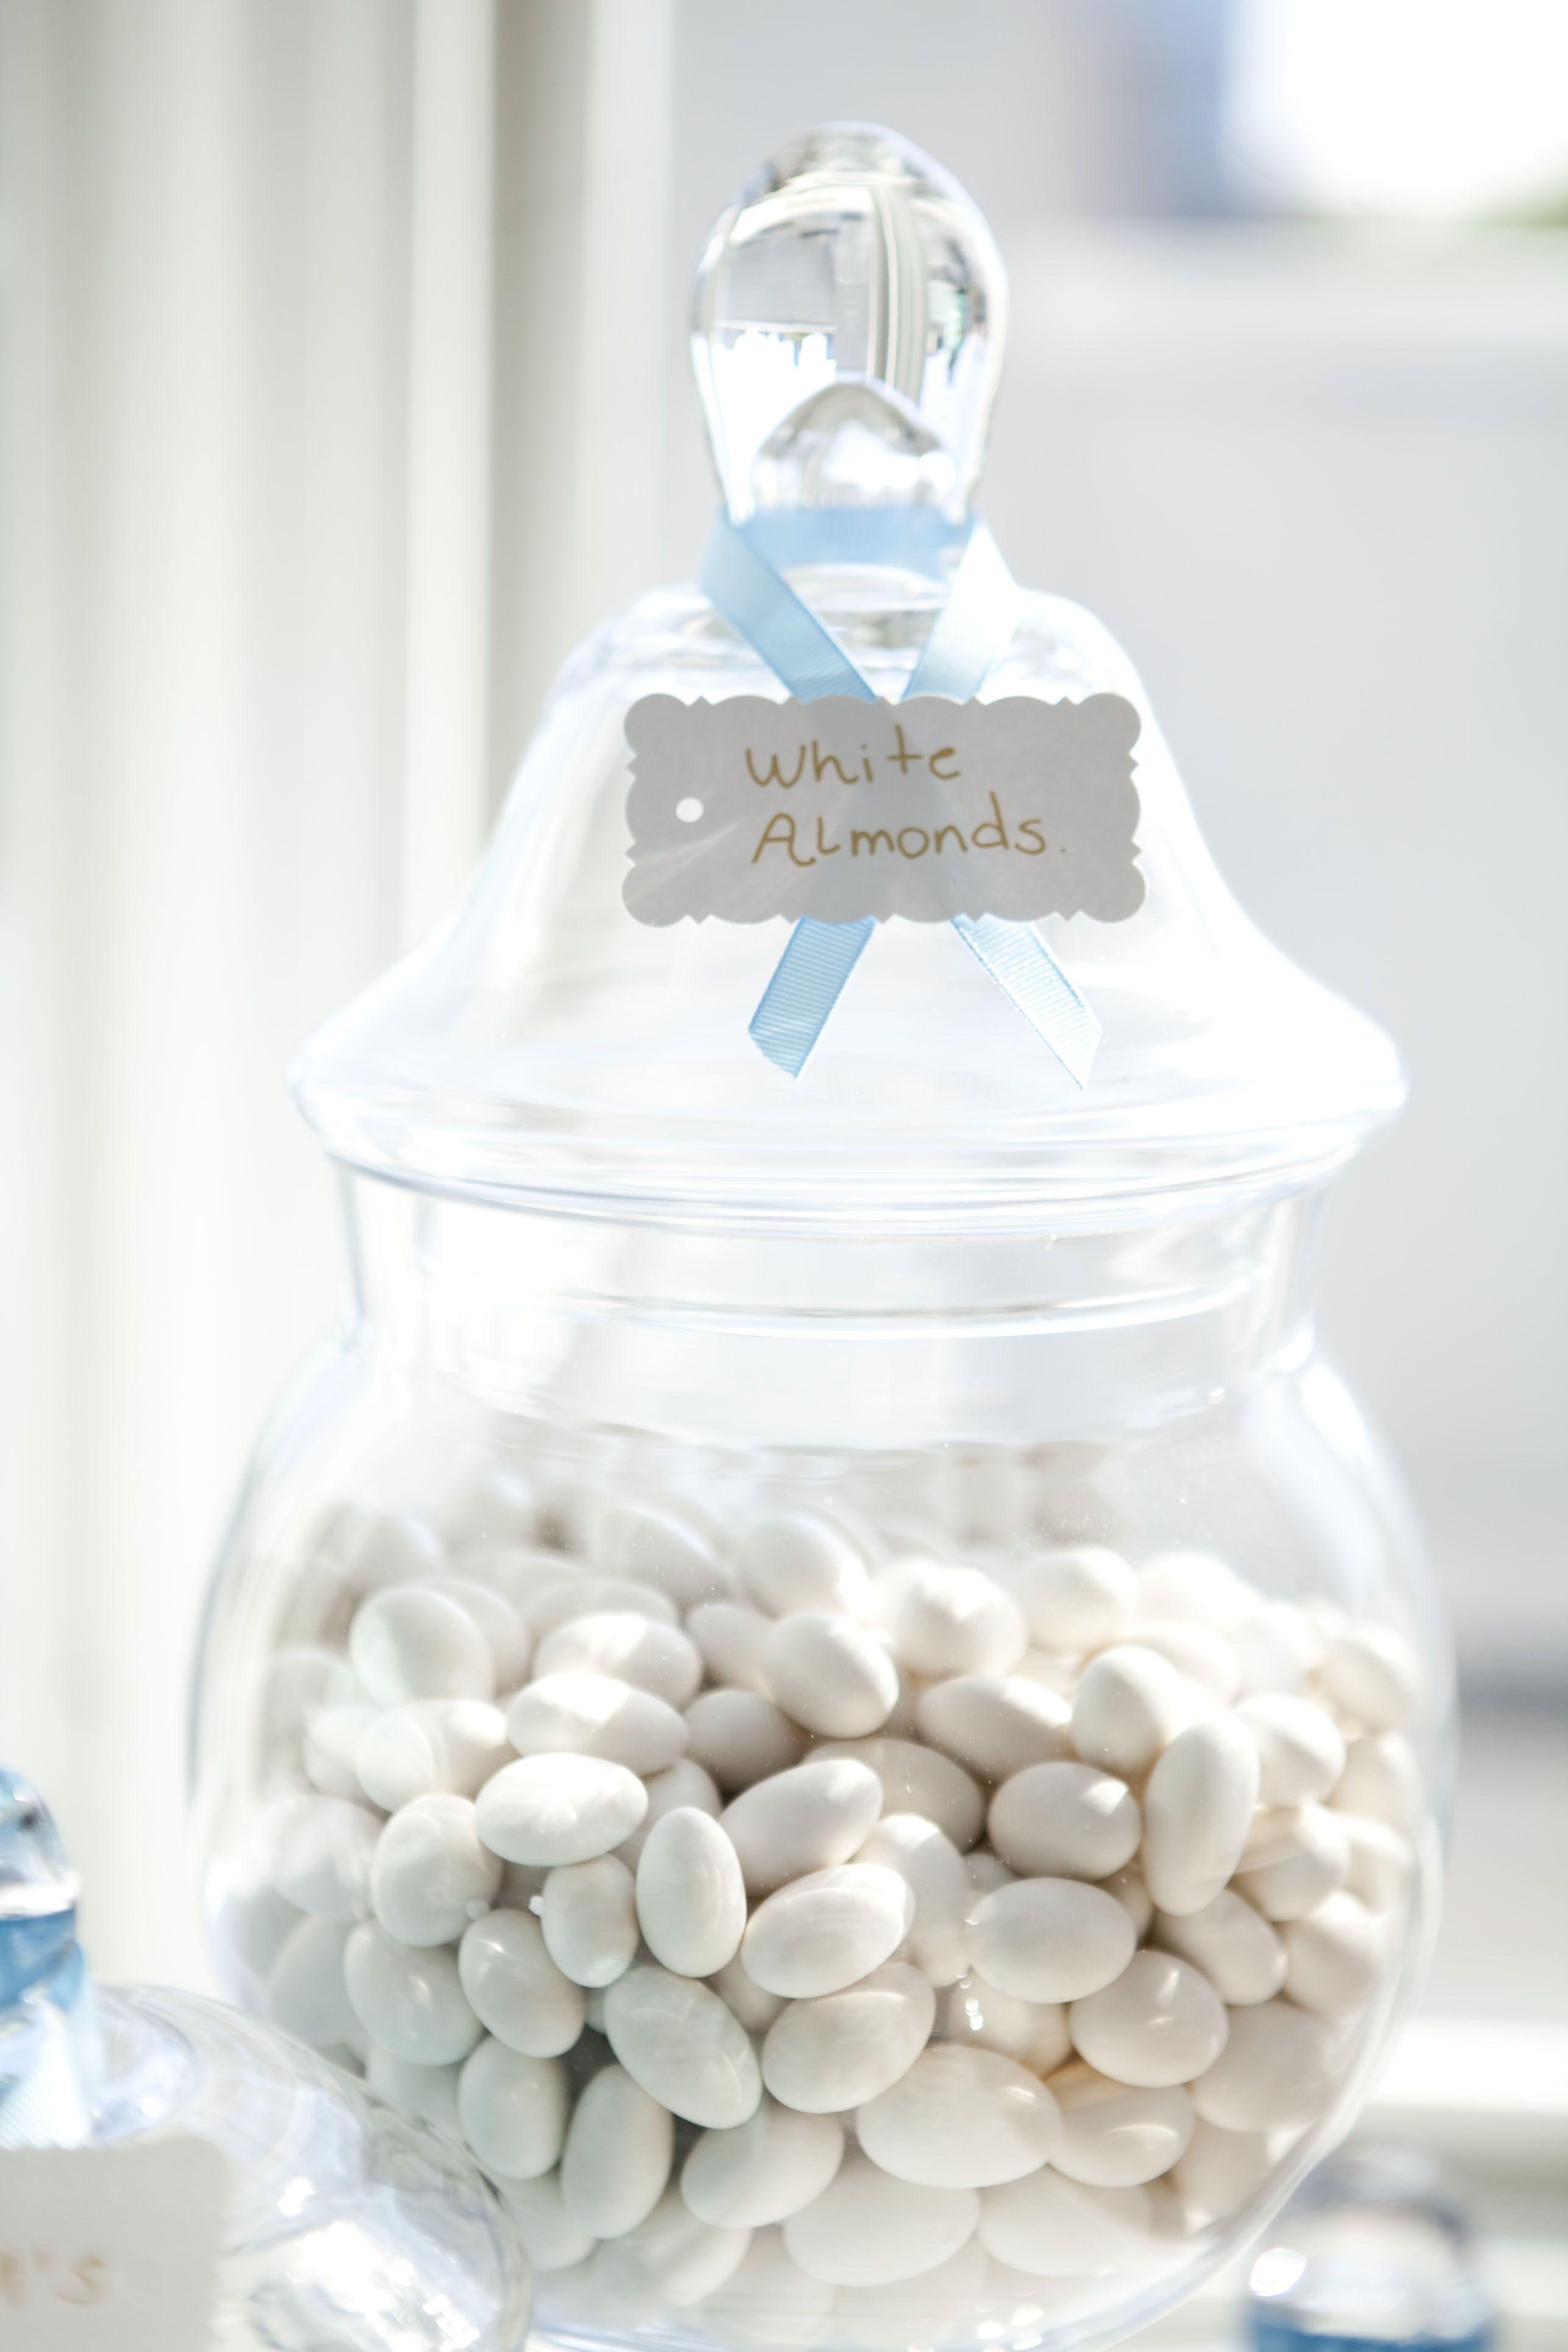 White almonds | communion | Pinterest | Communion